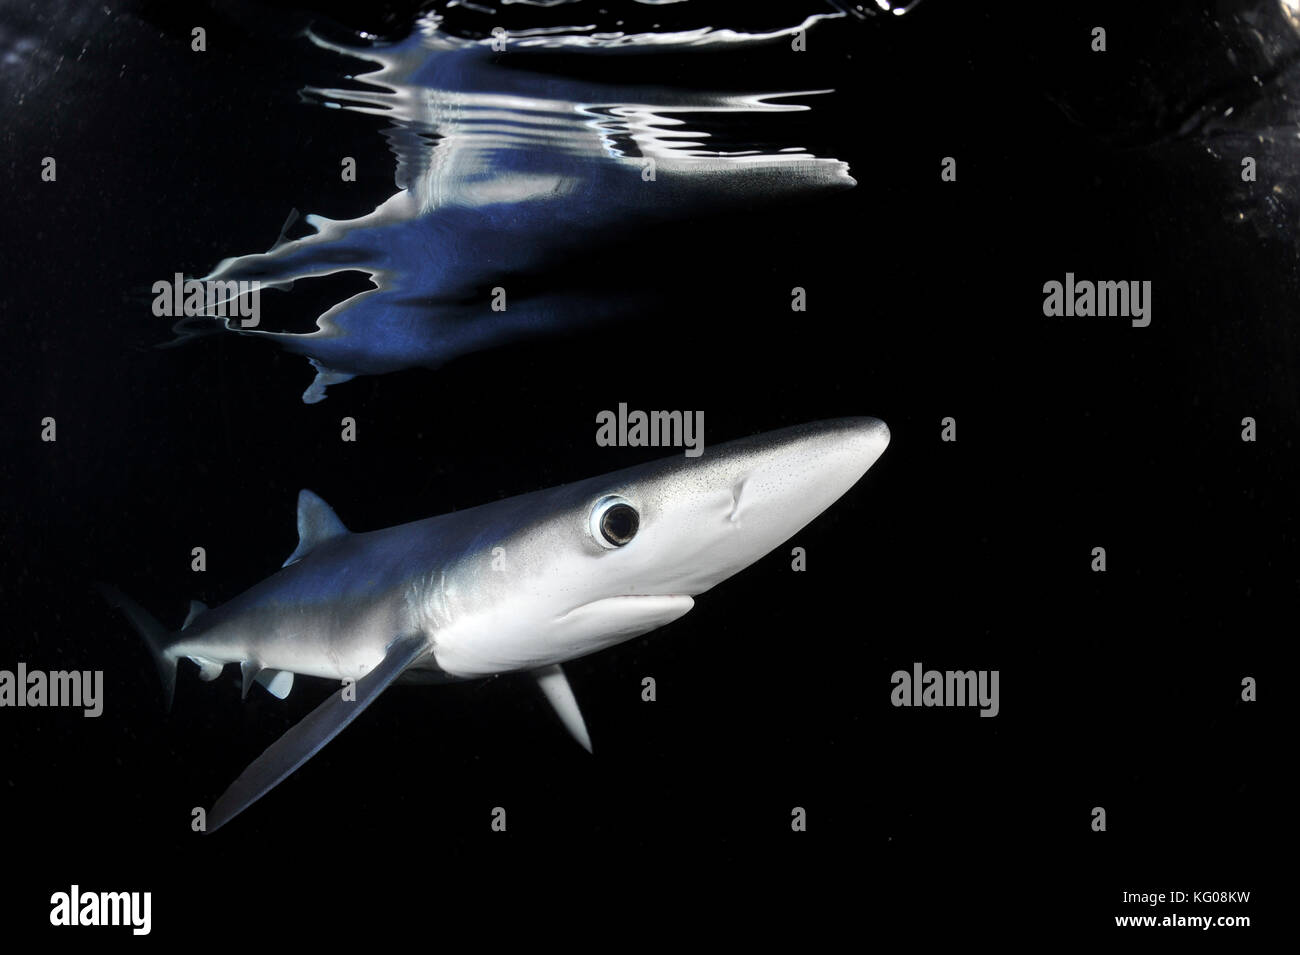 Blue shark at night Stock Photo